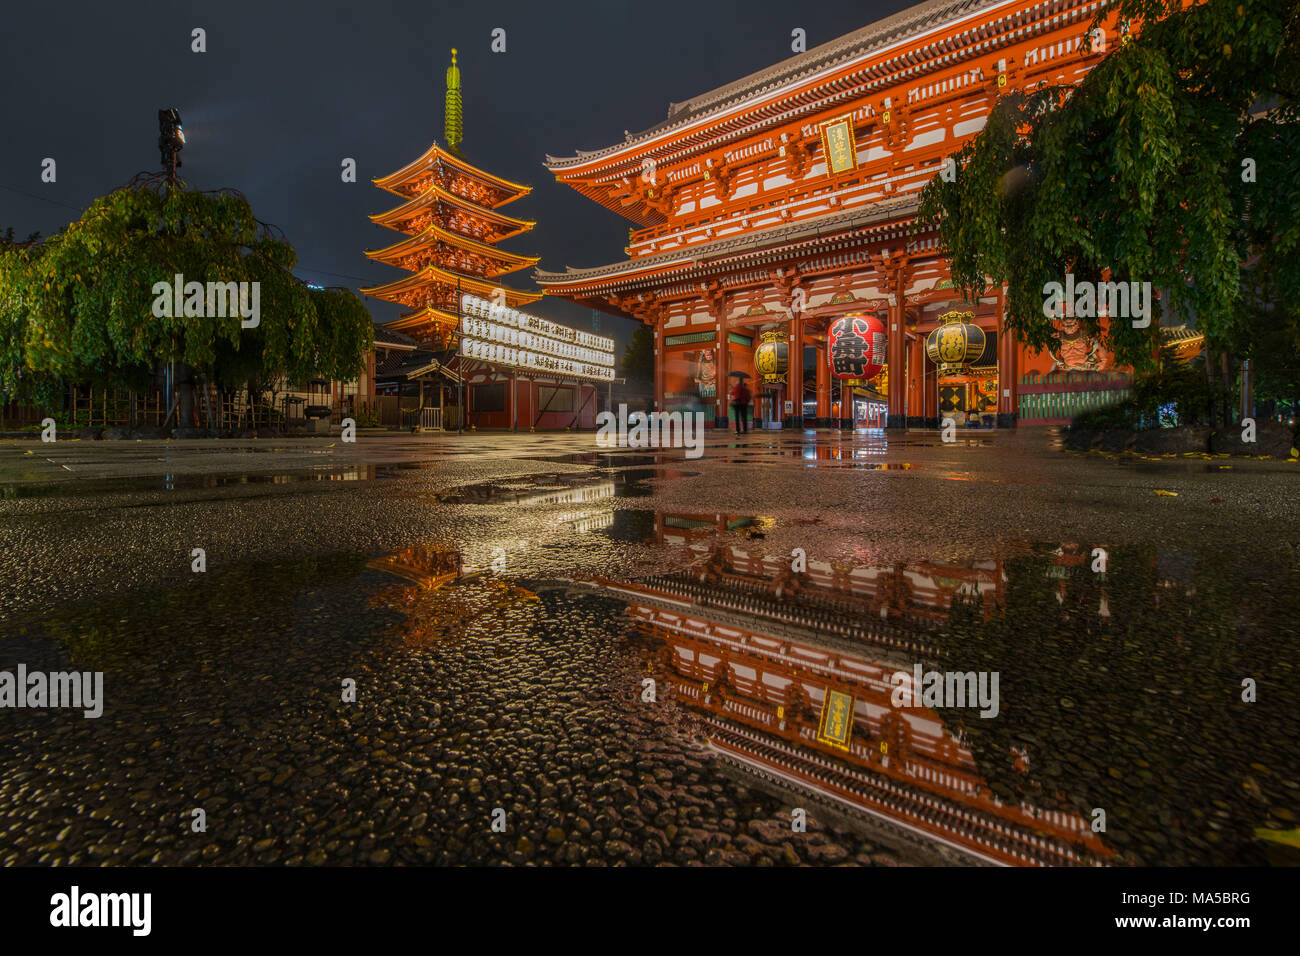 Asia, Japan, Nihon, Nippon, Tokyo, Taito, Asakusa, Sens?-ji temple complex with pagoda Stock Photo